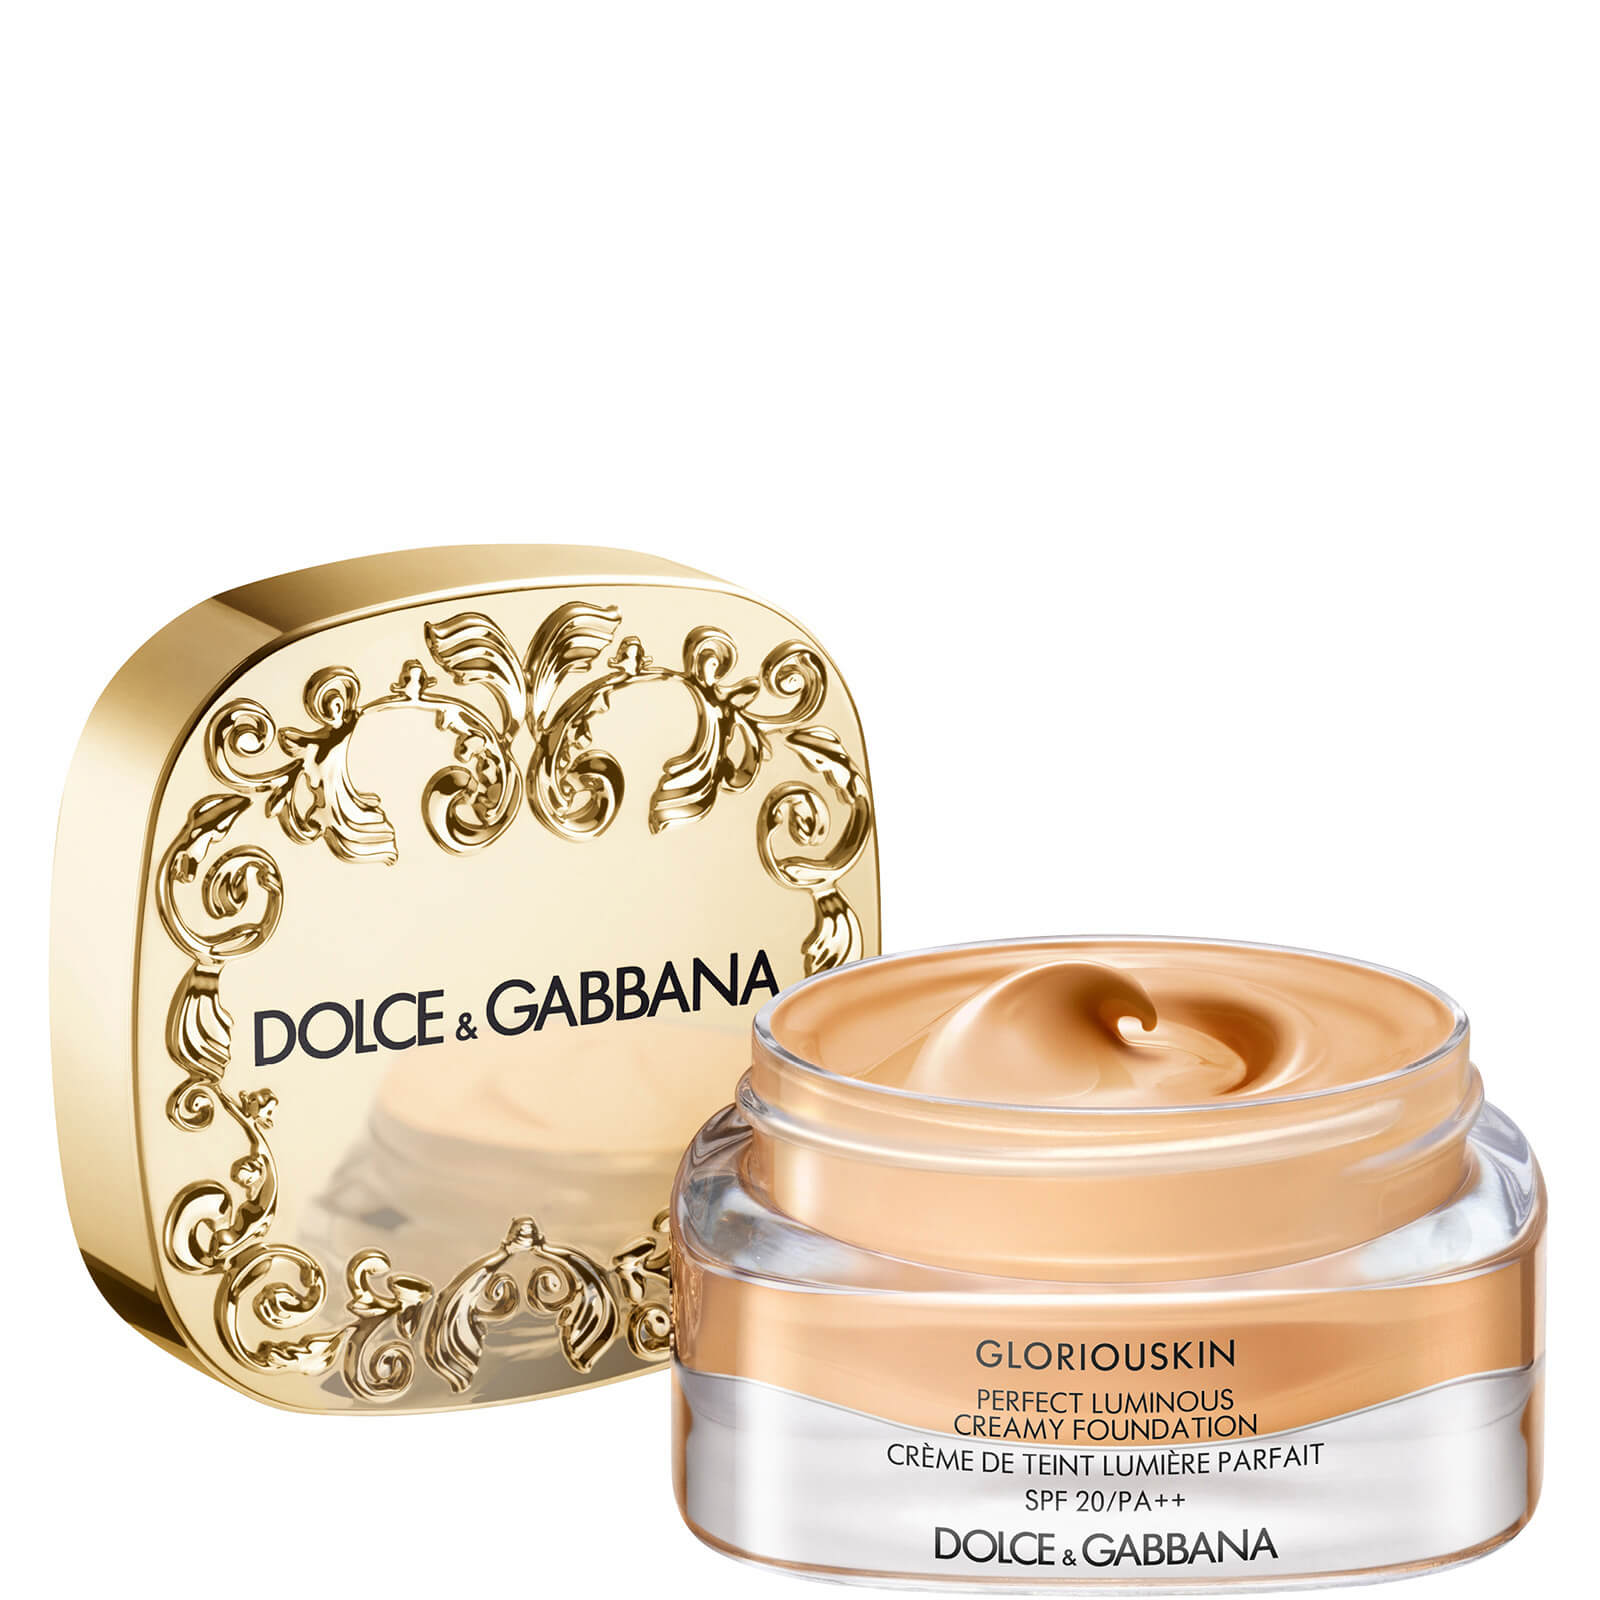 Dolce&Gabbana Gloriouskin Perfect Luminous Creamy Foundation 30ml (Various Shades) - Cashmere 200